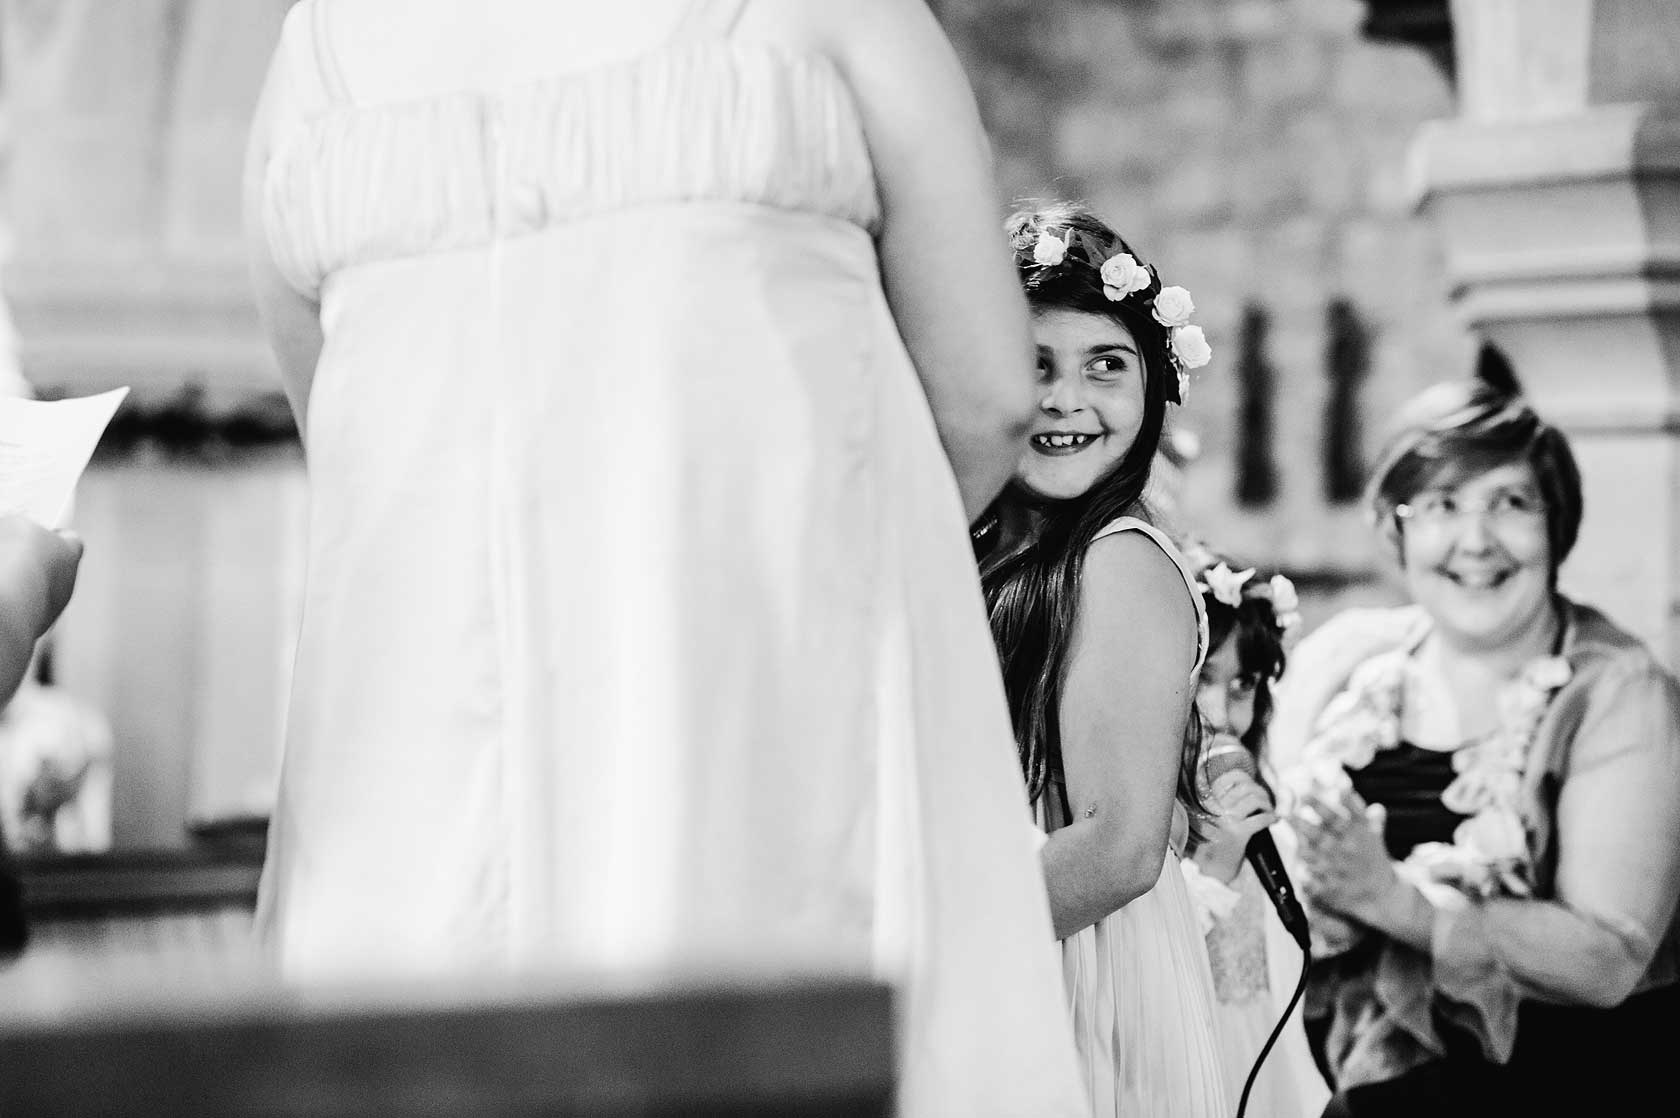 Reportage Wedding Photography at Crazy Bear